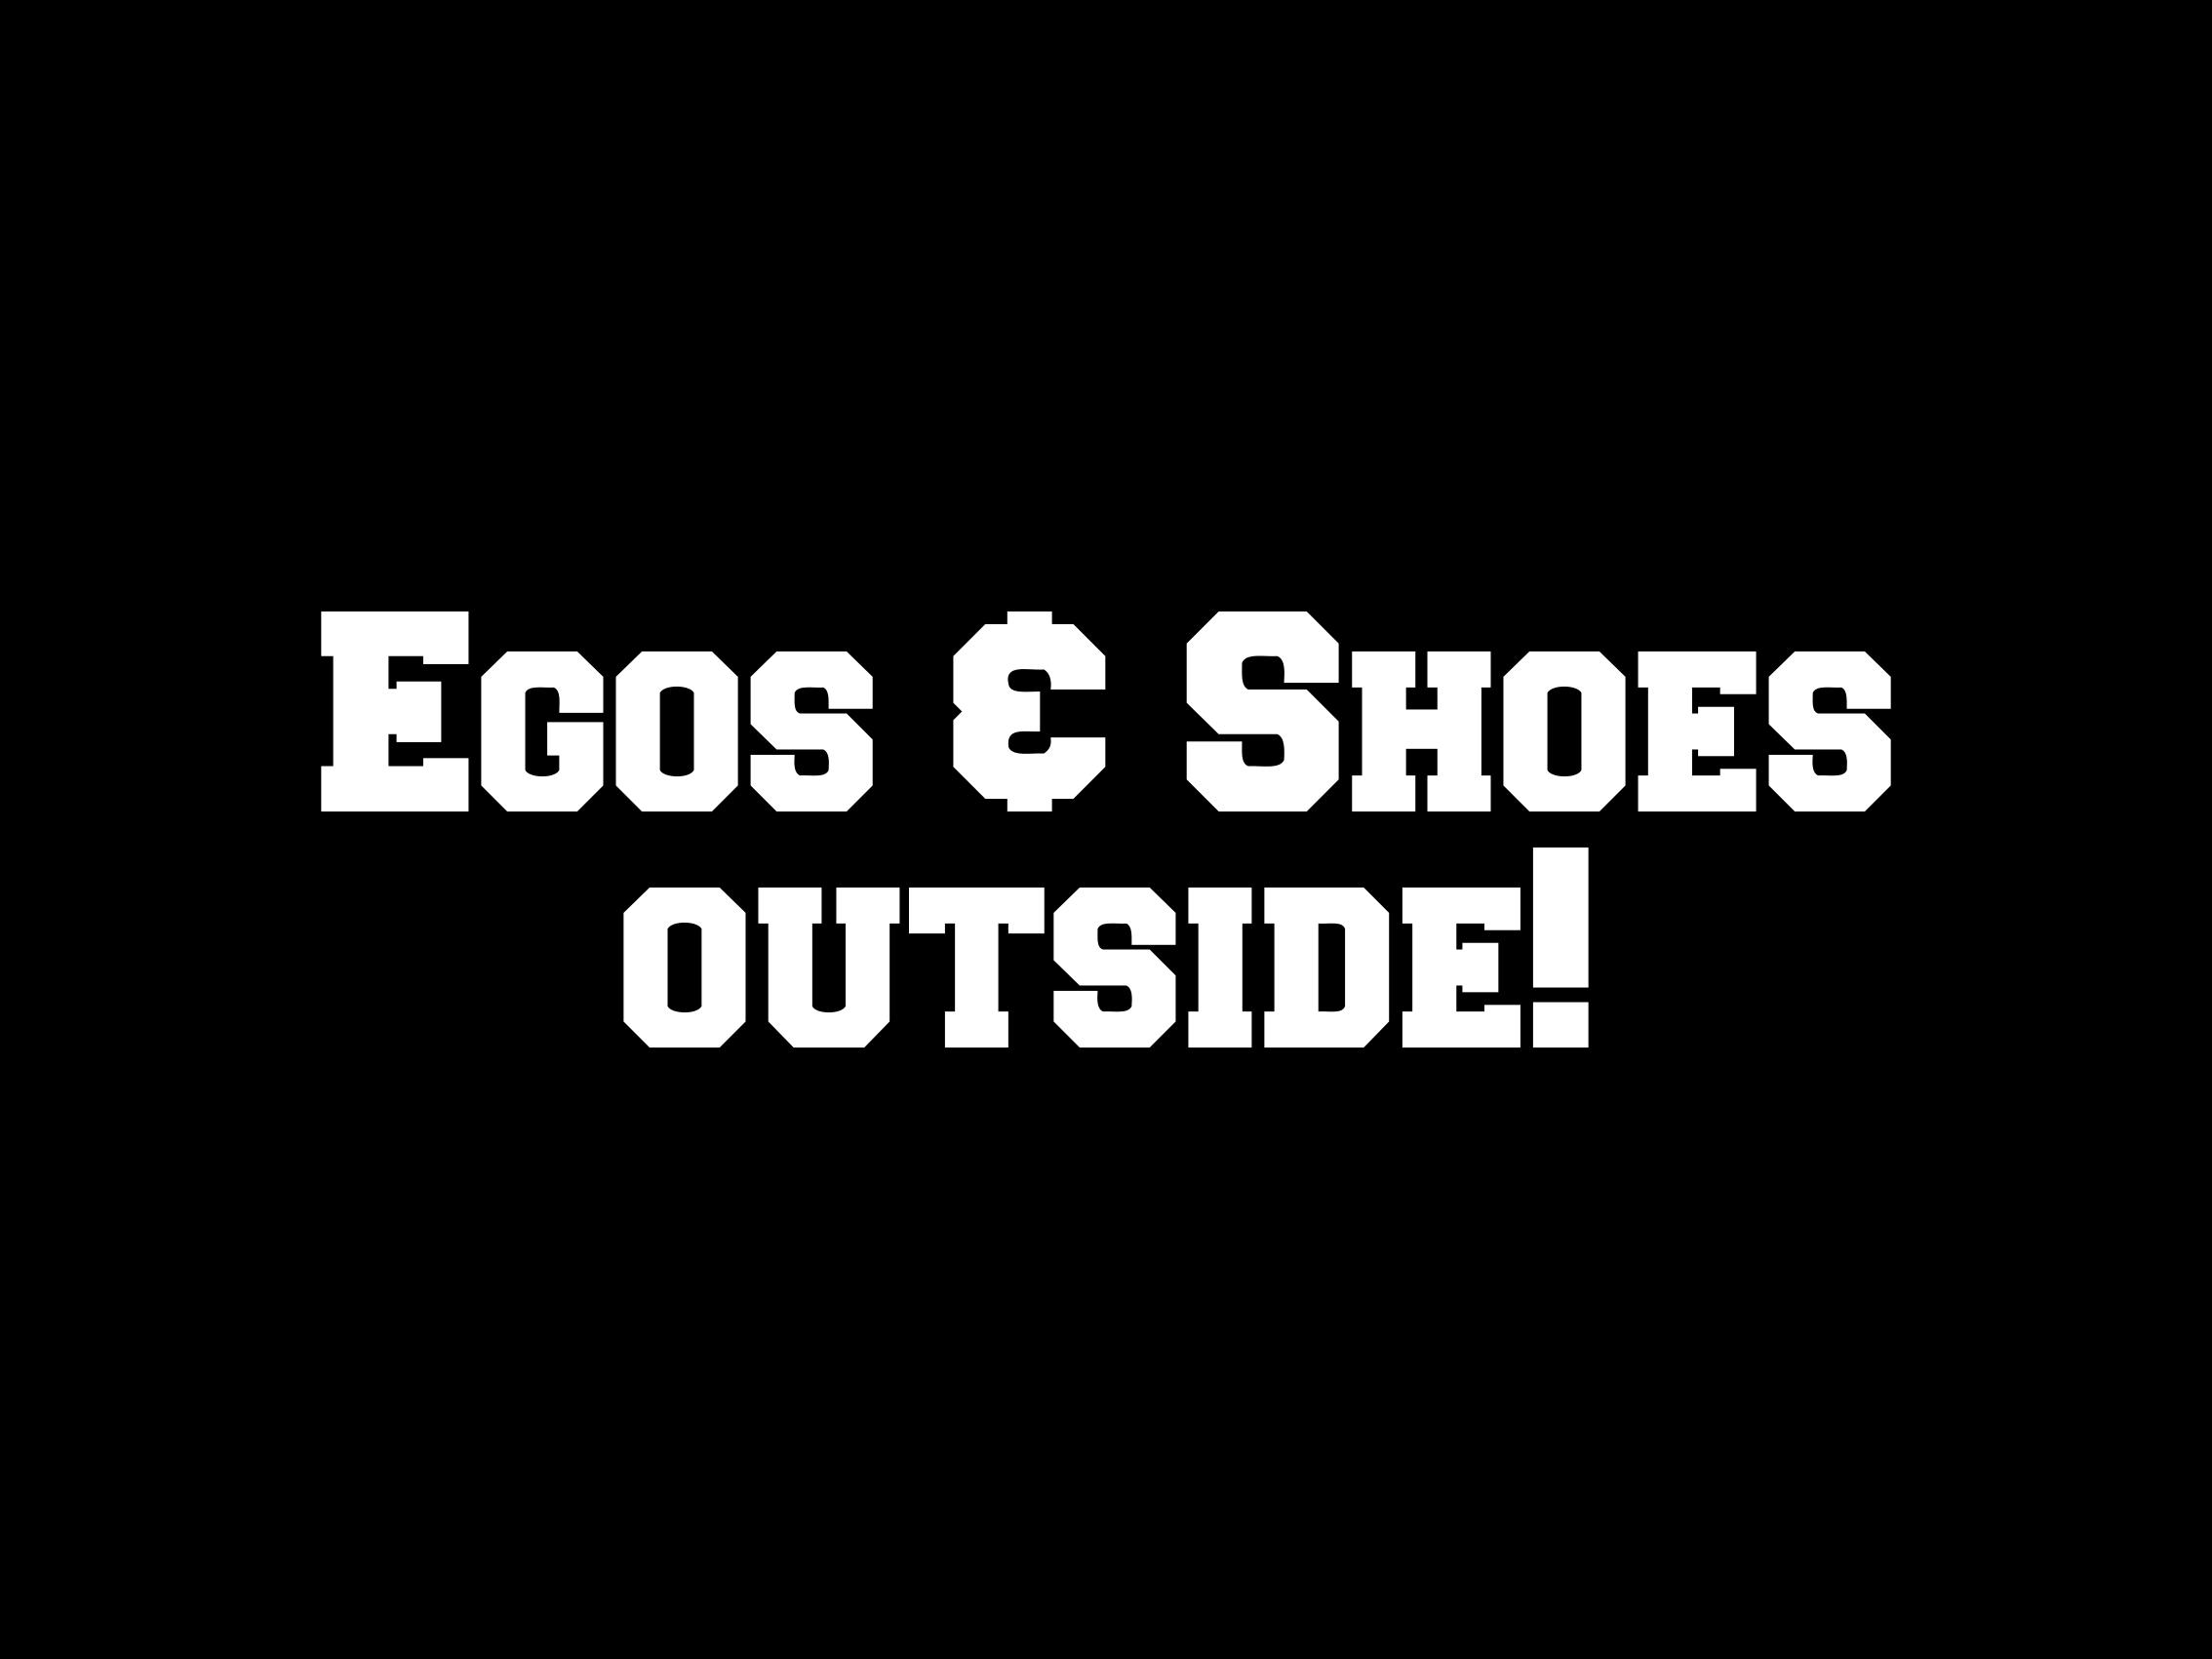 Footmat egos & shoes outside PM-121728-1763